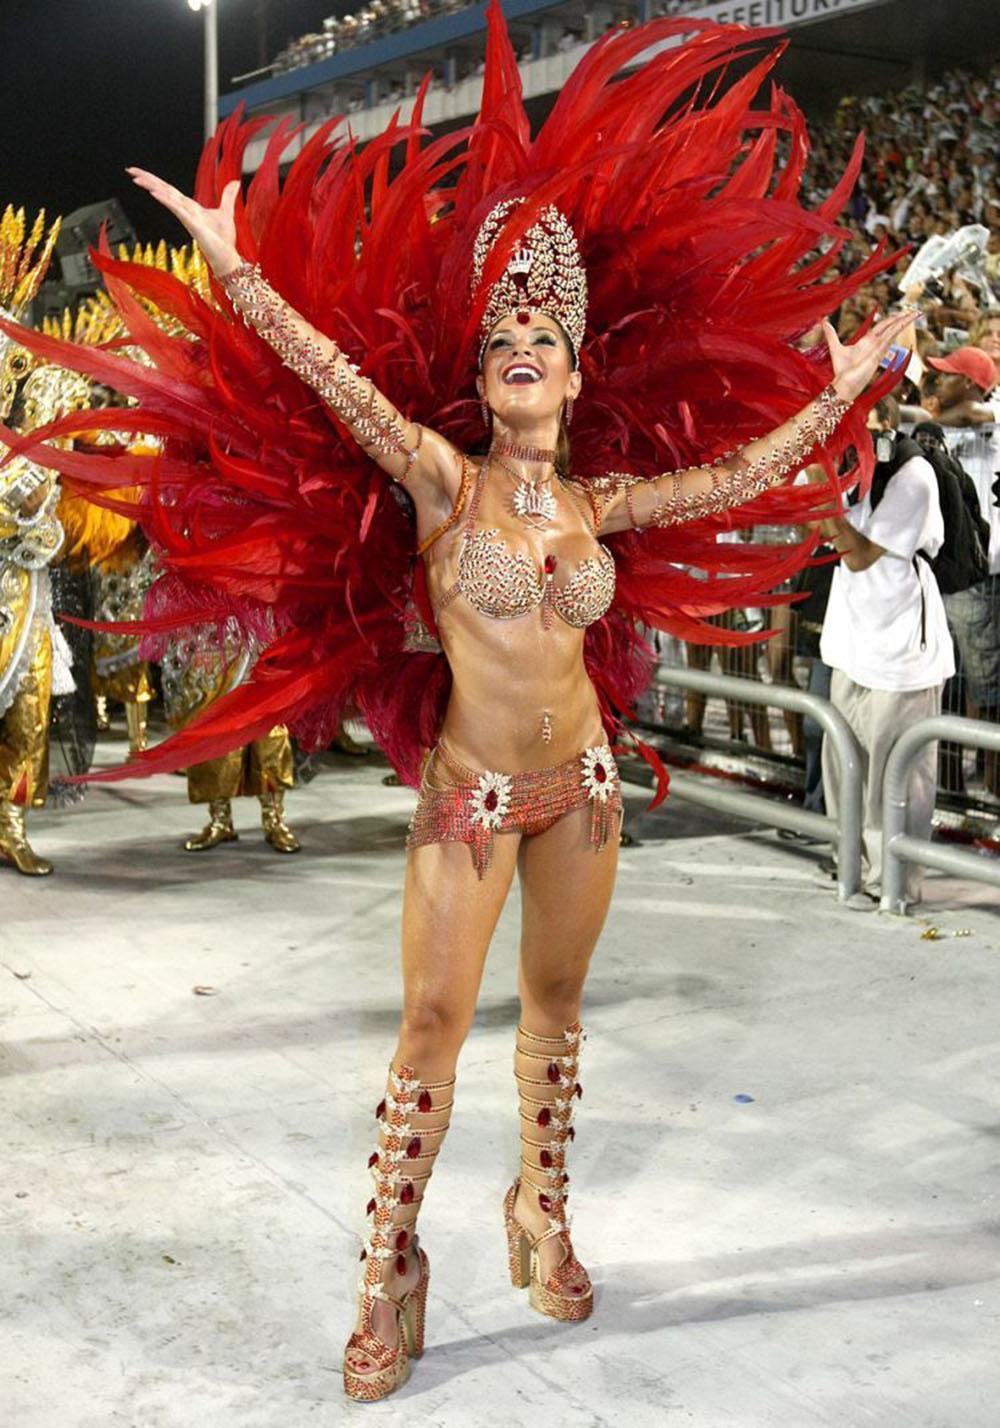 carnaval_61-1000x